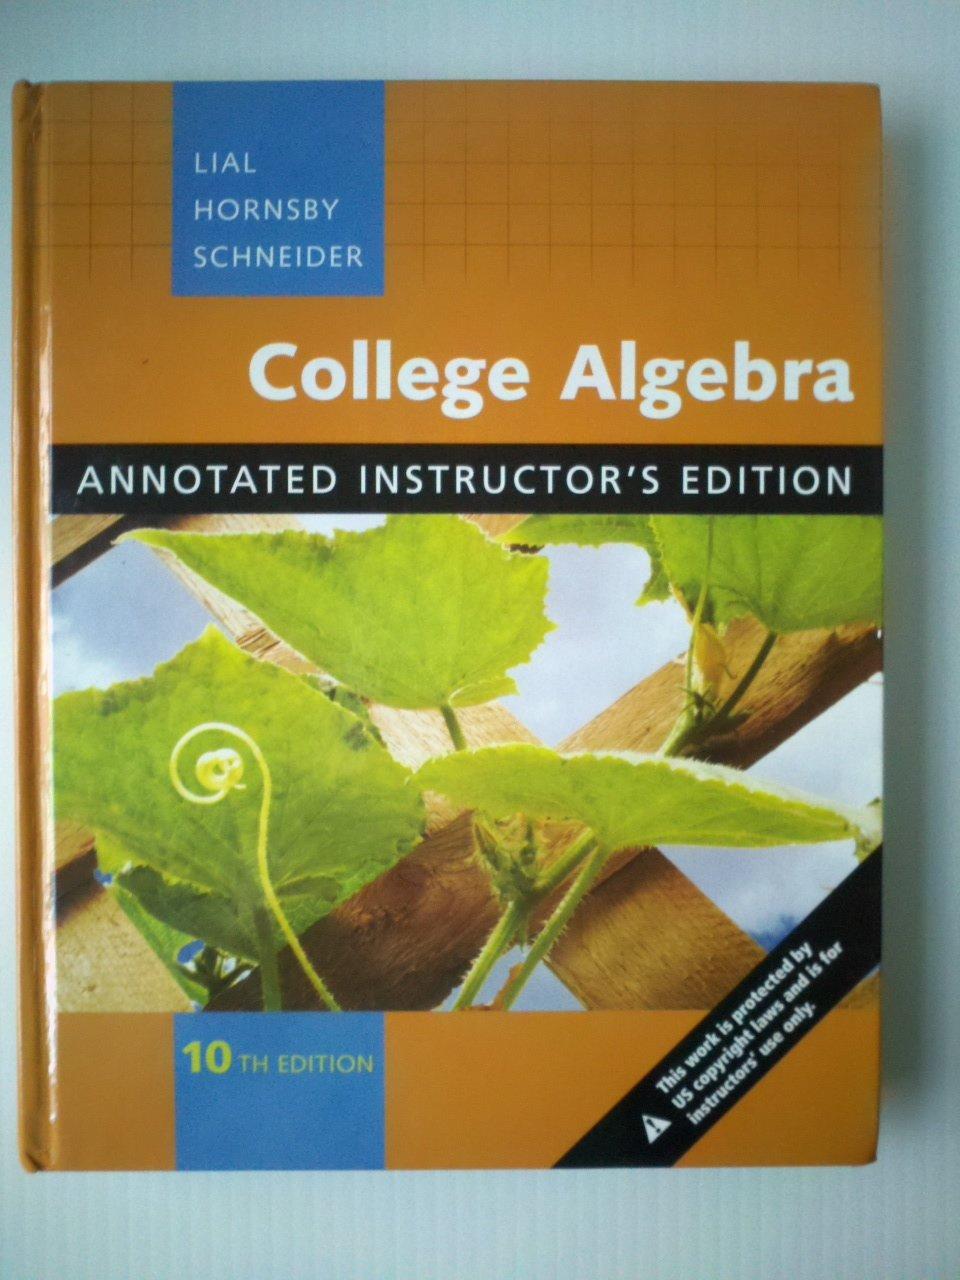 College Algebra Annotated Instructor Edition: Margaret L. Lial:  9780321501486: Amazon.com: Books